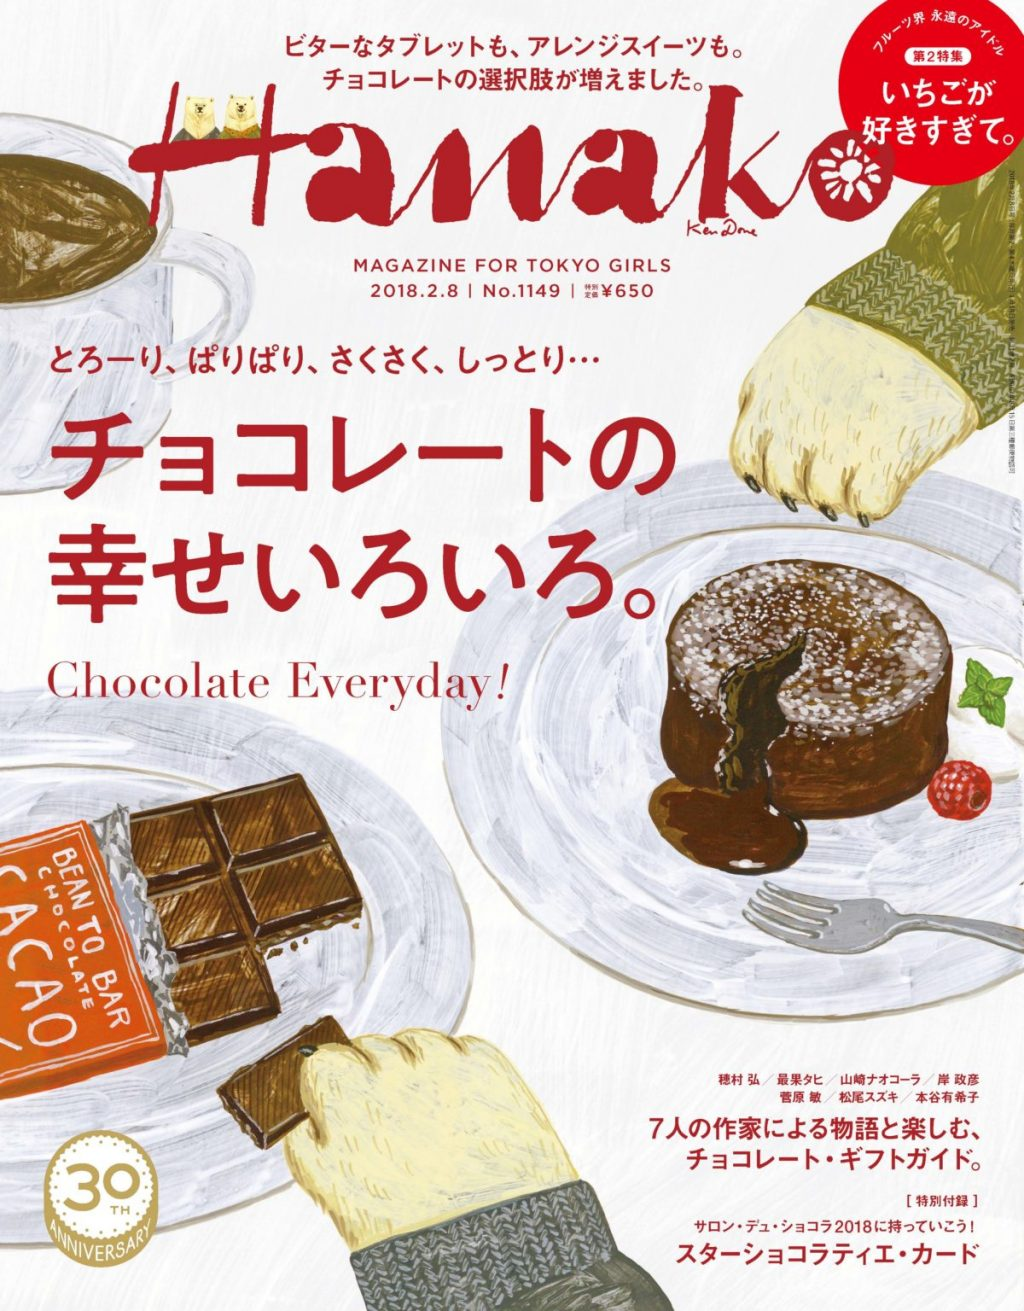 <span>No. 1149<br> とろーり、ぱりぱり、さくさく、しっとり…</span>チョコレートの幸せいろいろ。